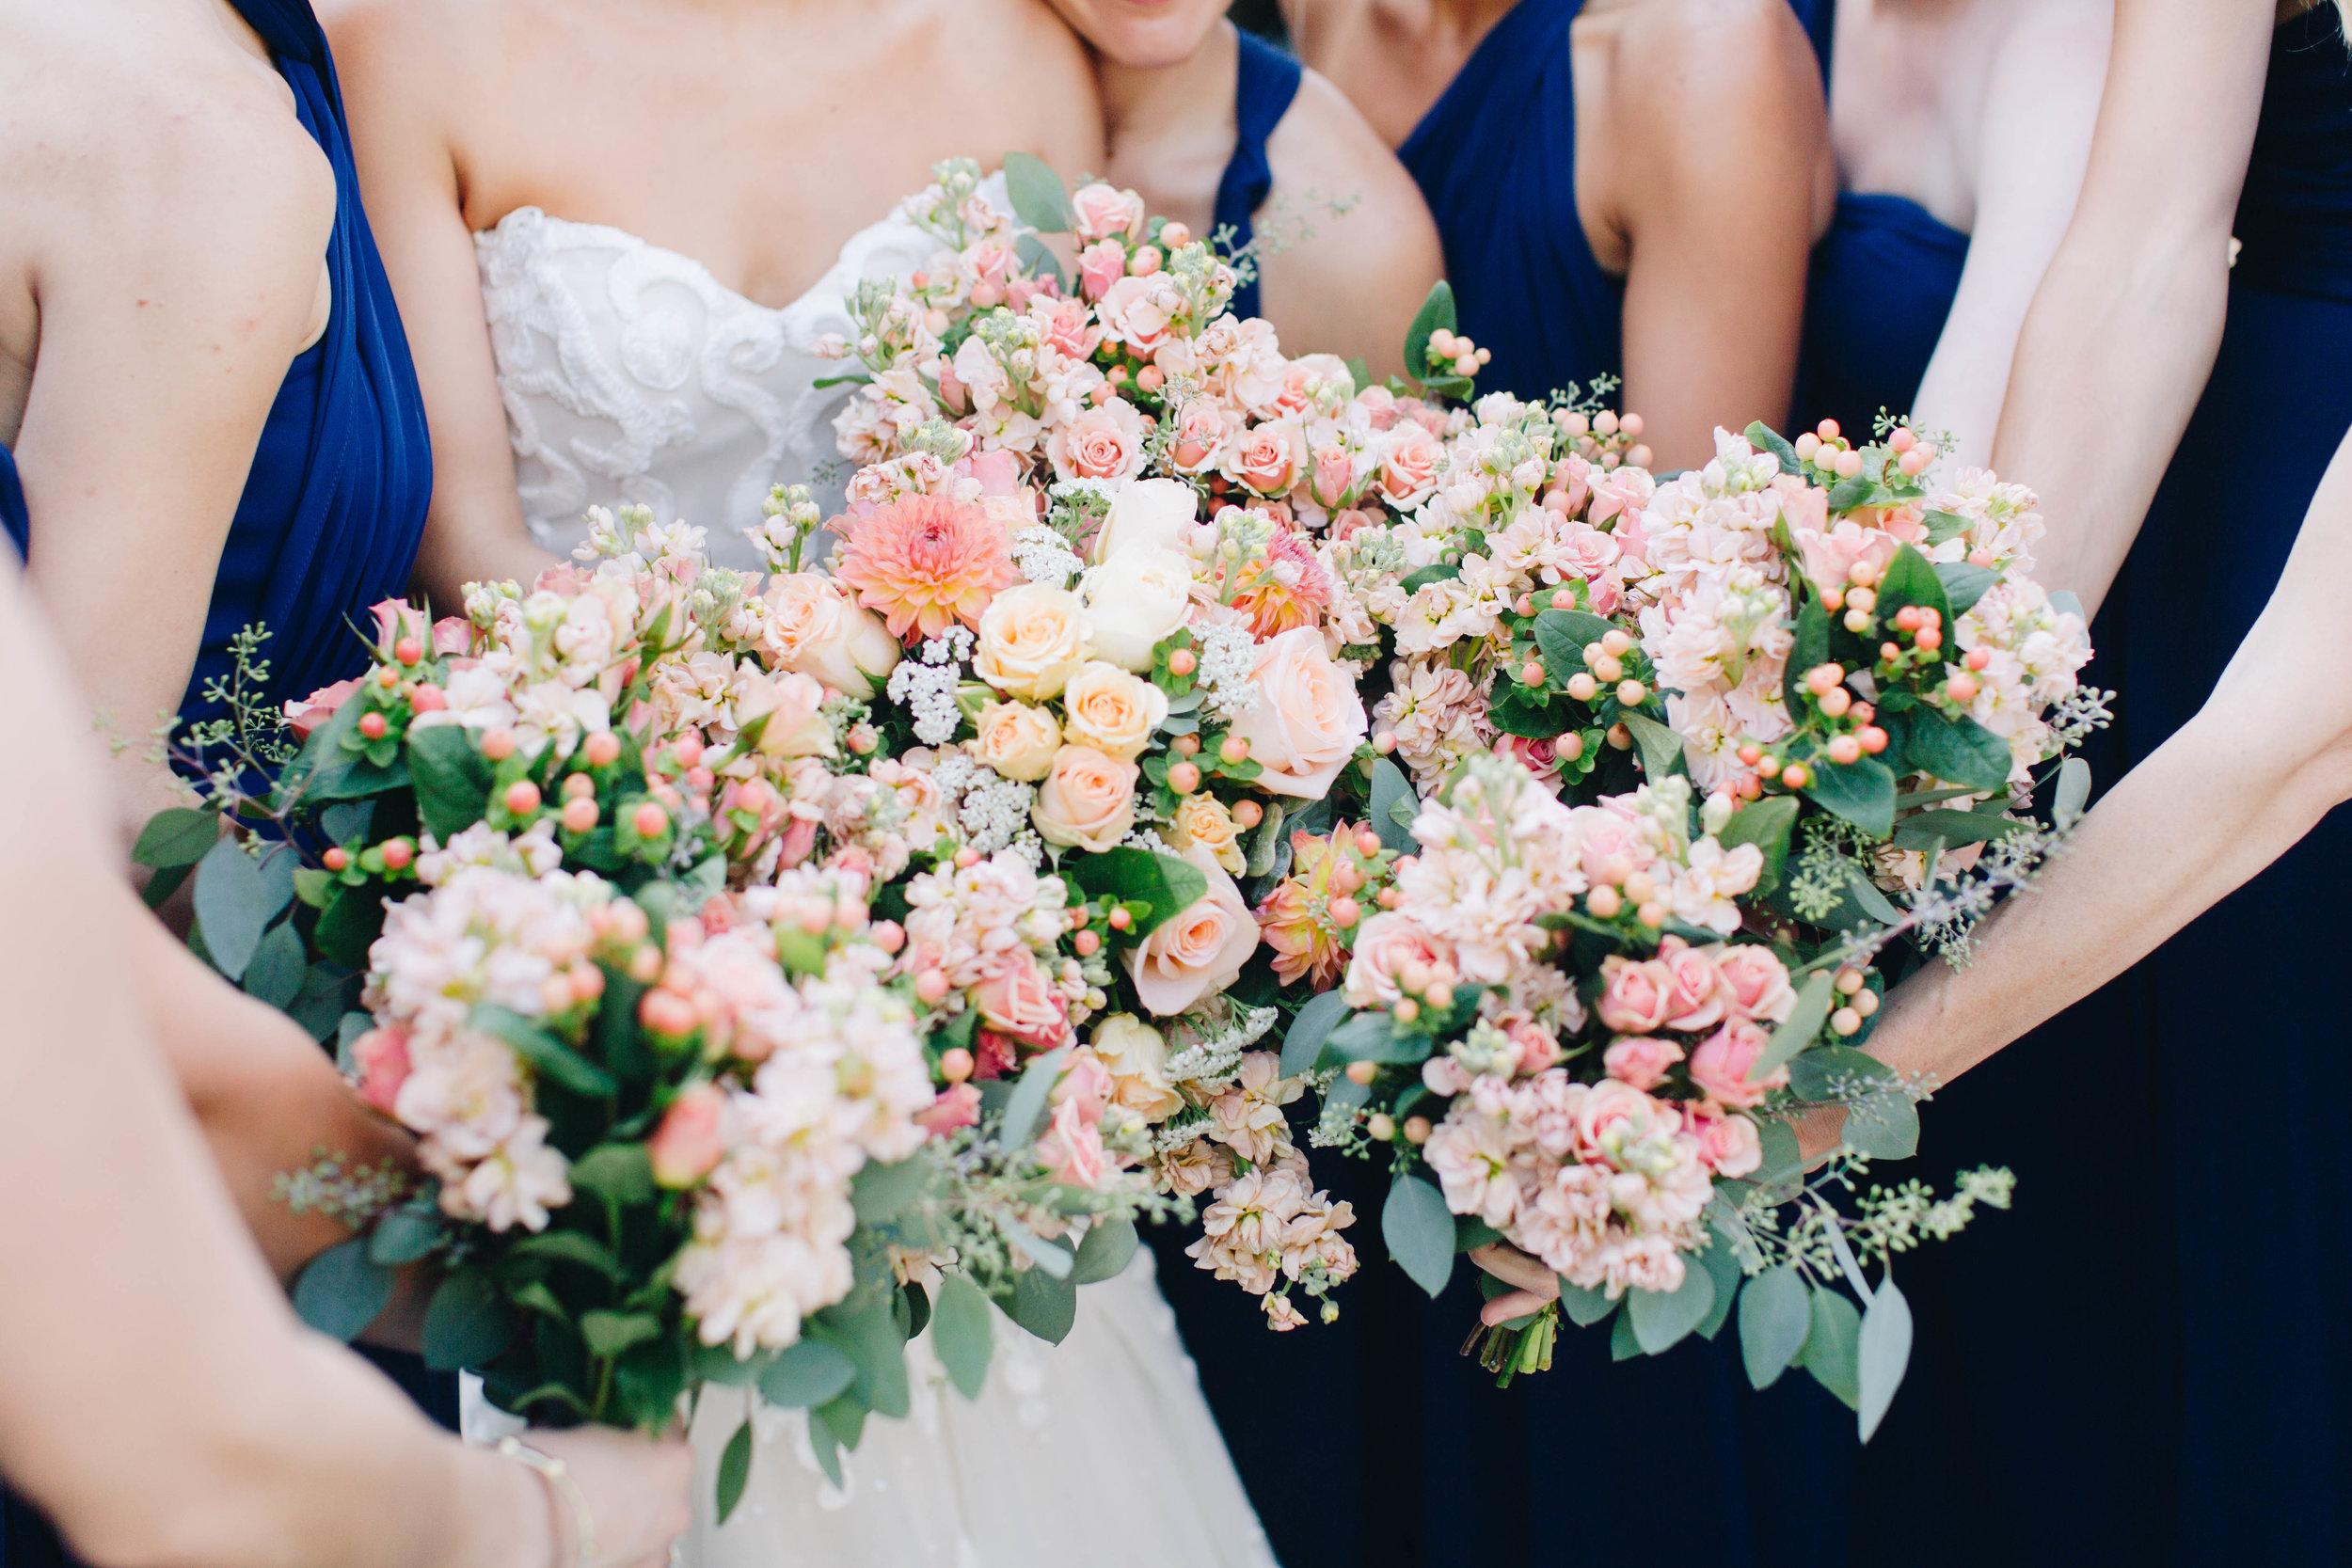 weddinghighlights-28.jpg